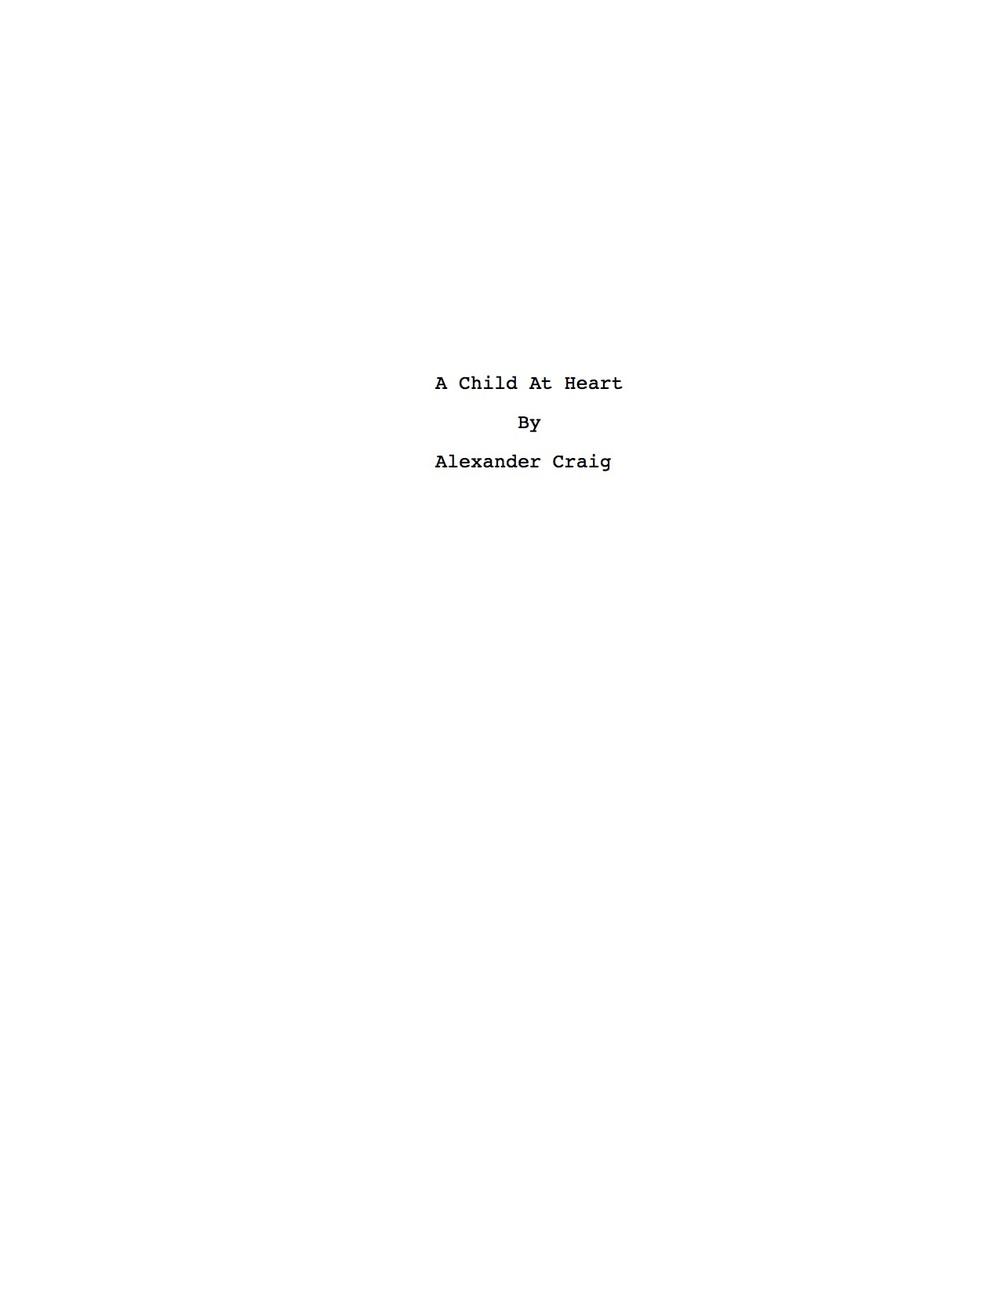 'A Child At Heart' by Alexander Craig | T.jpg